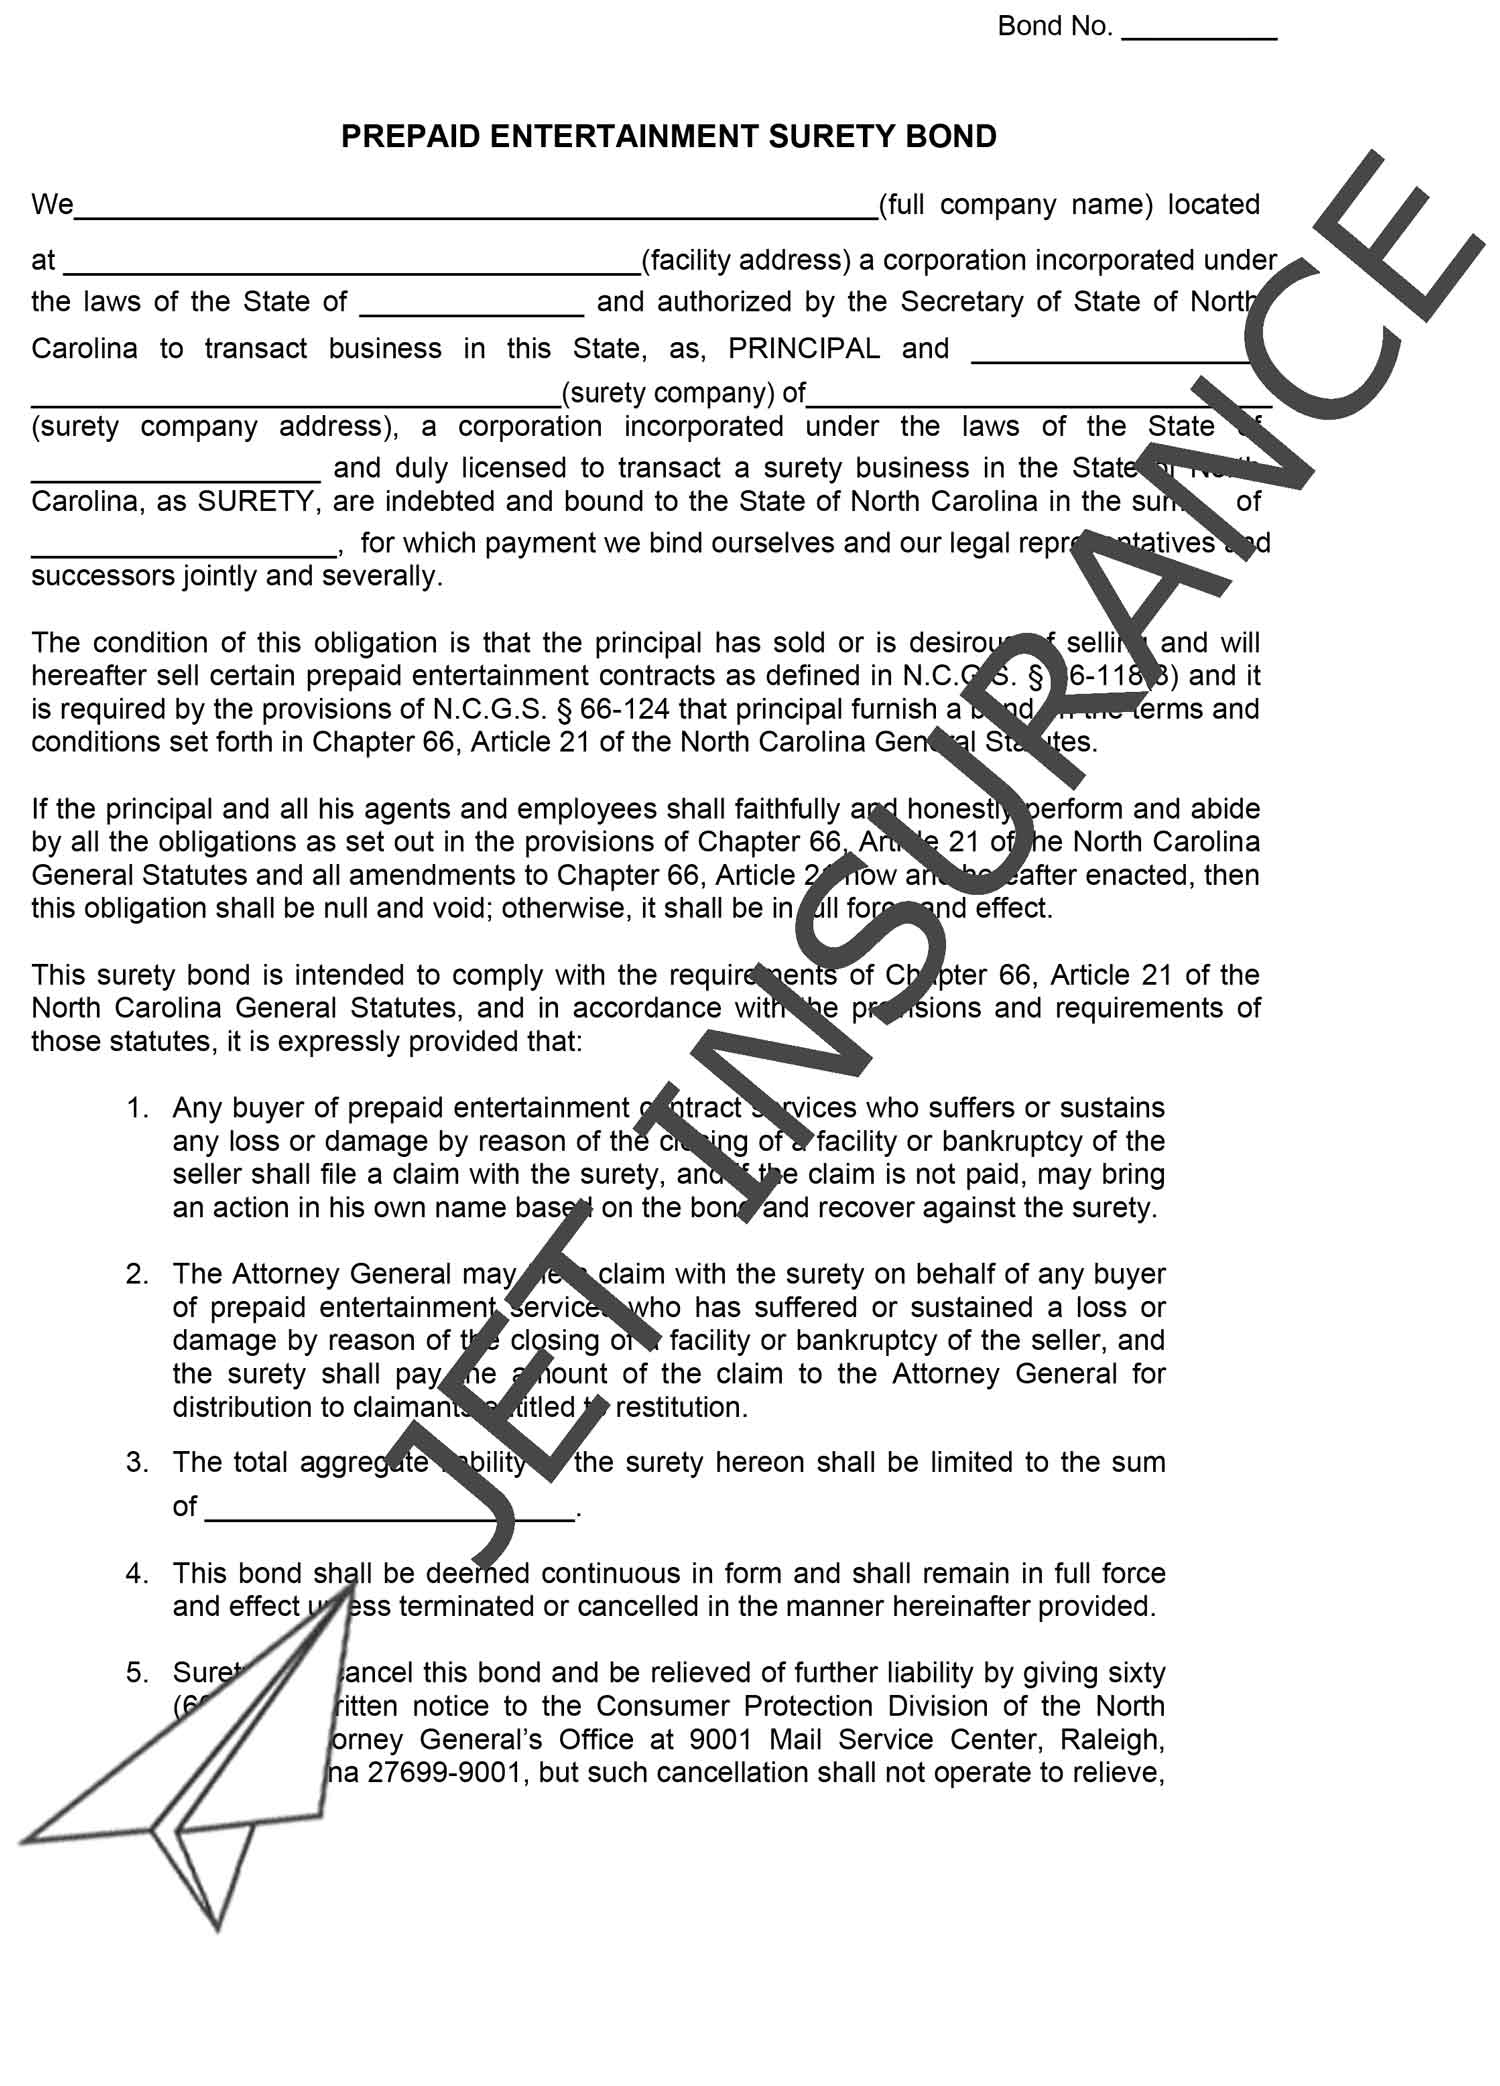 North Carolina Health Club & Prepaid Entertainment Service Bond Form